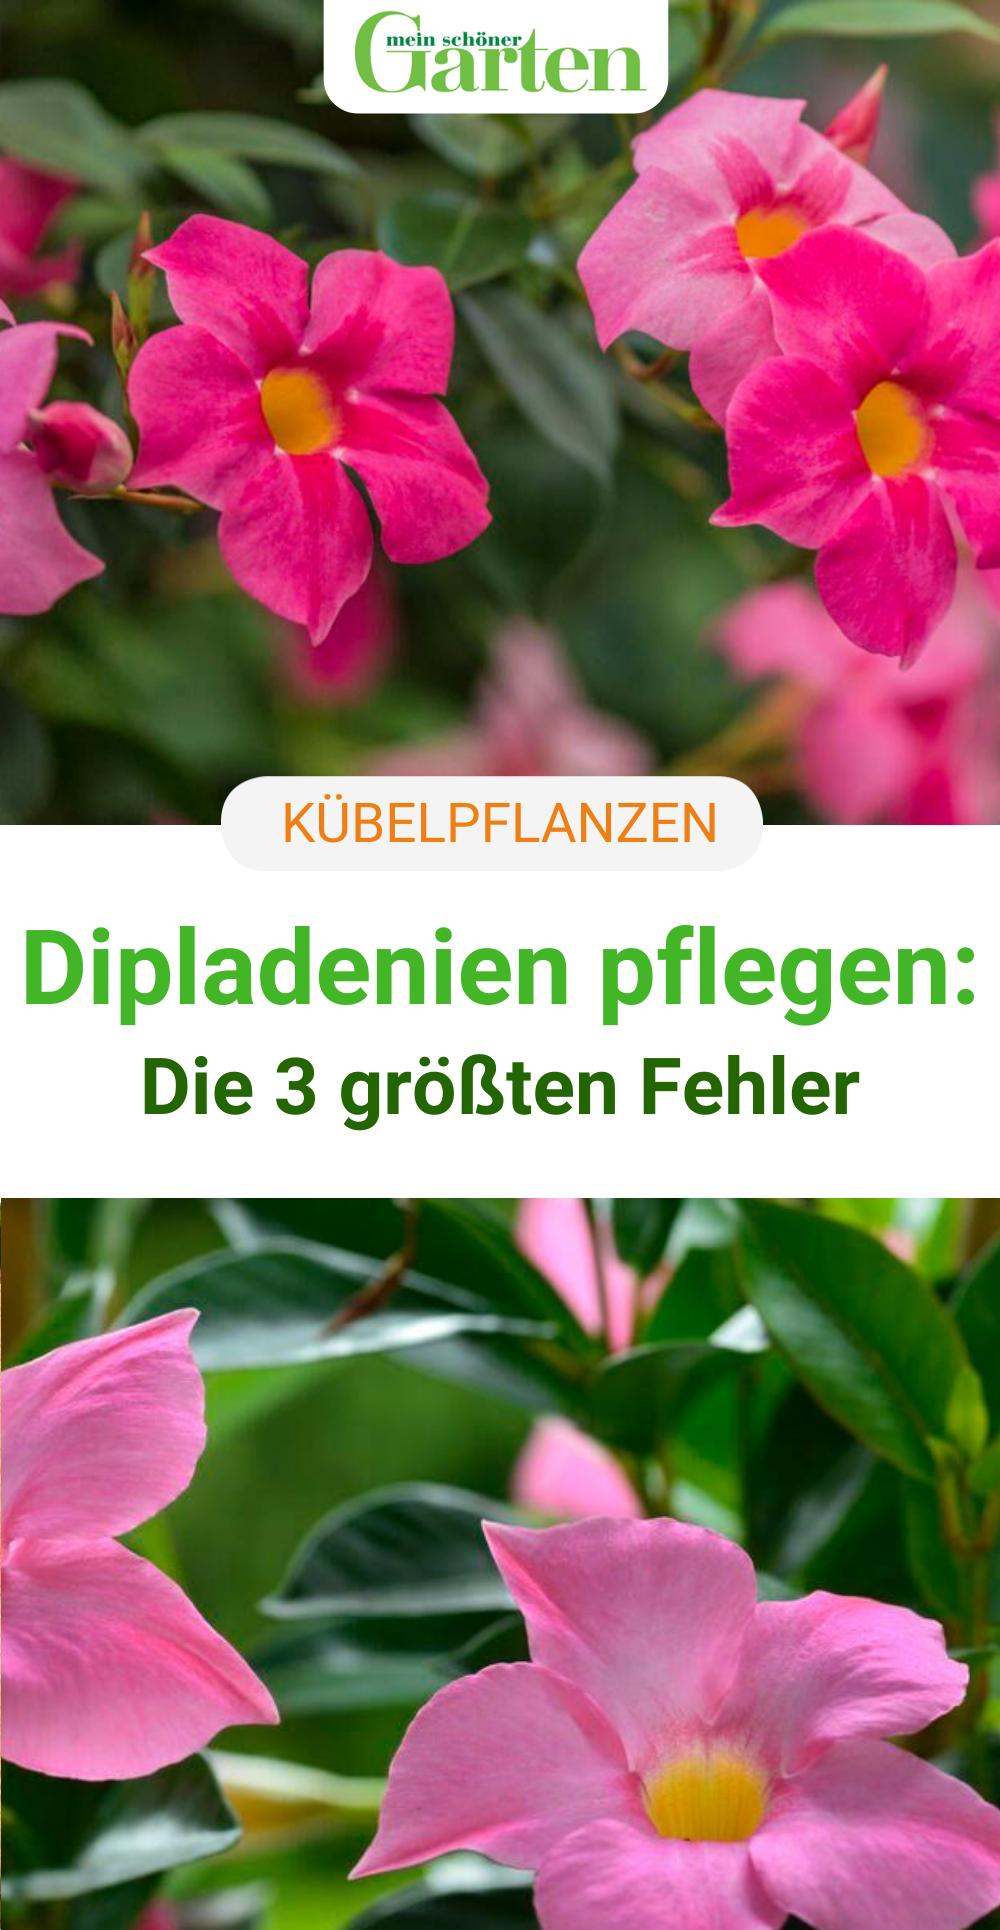 Kubelpflanzen Dipladenien Pflegen In 2020 Kubelpflanzen Pflanzen Garten Pflanzen